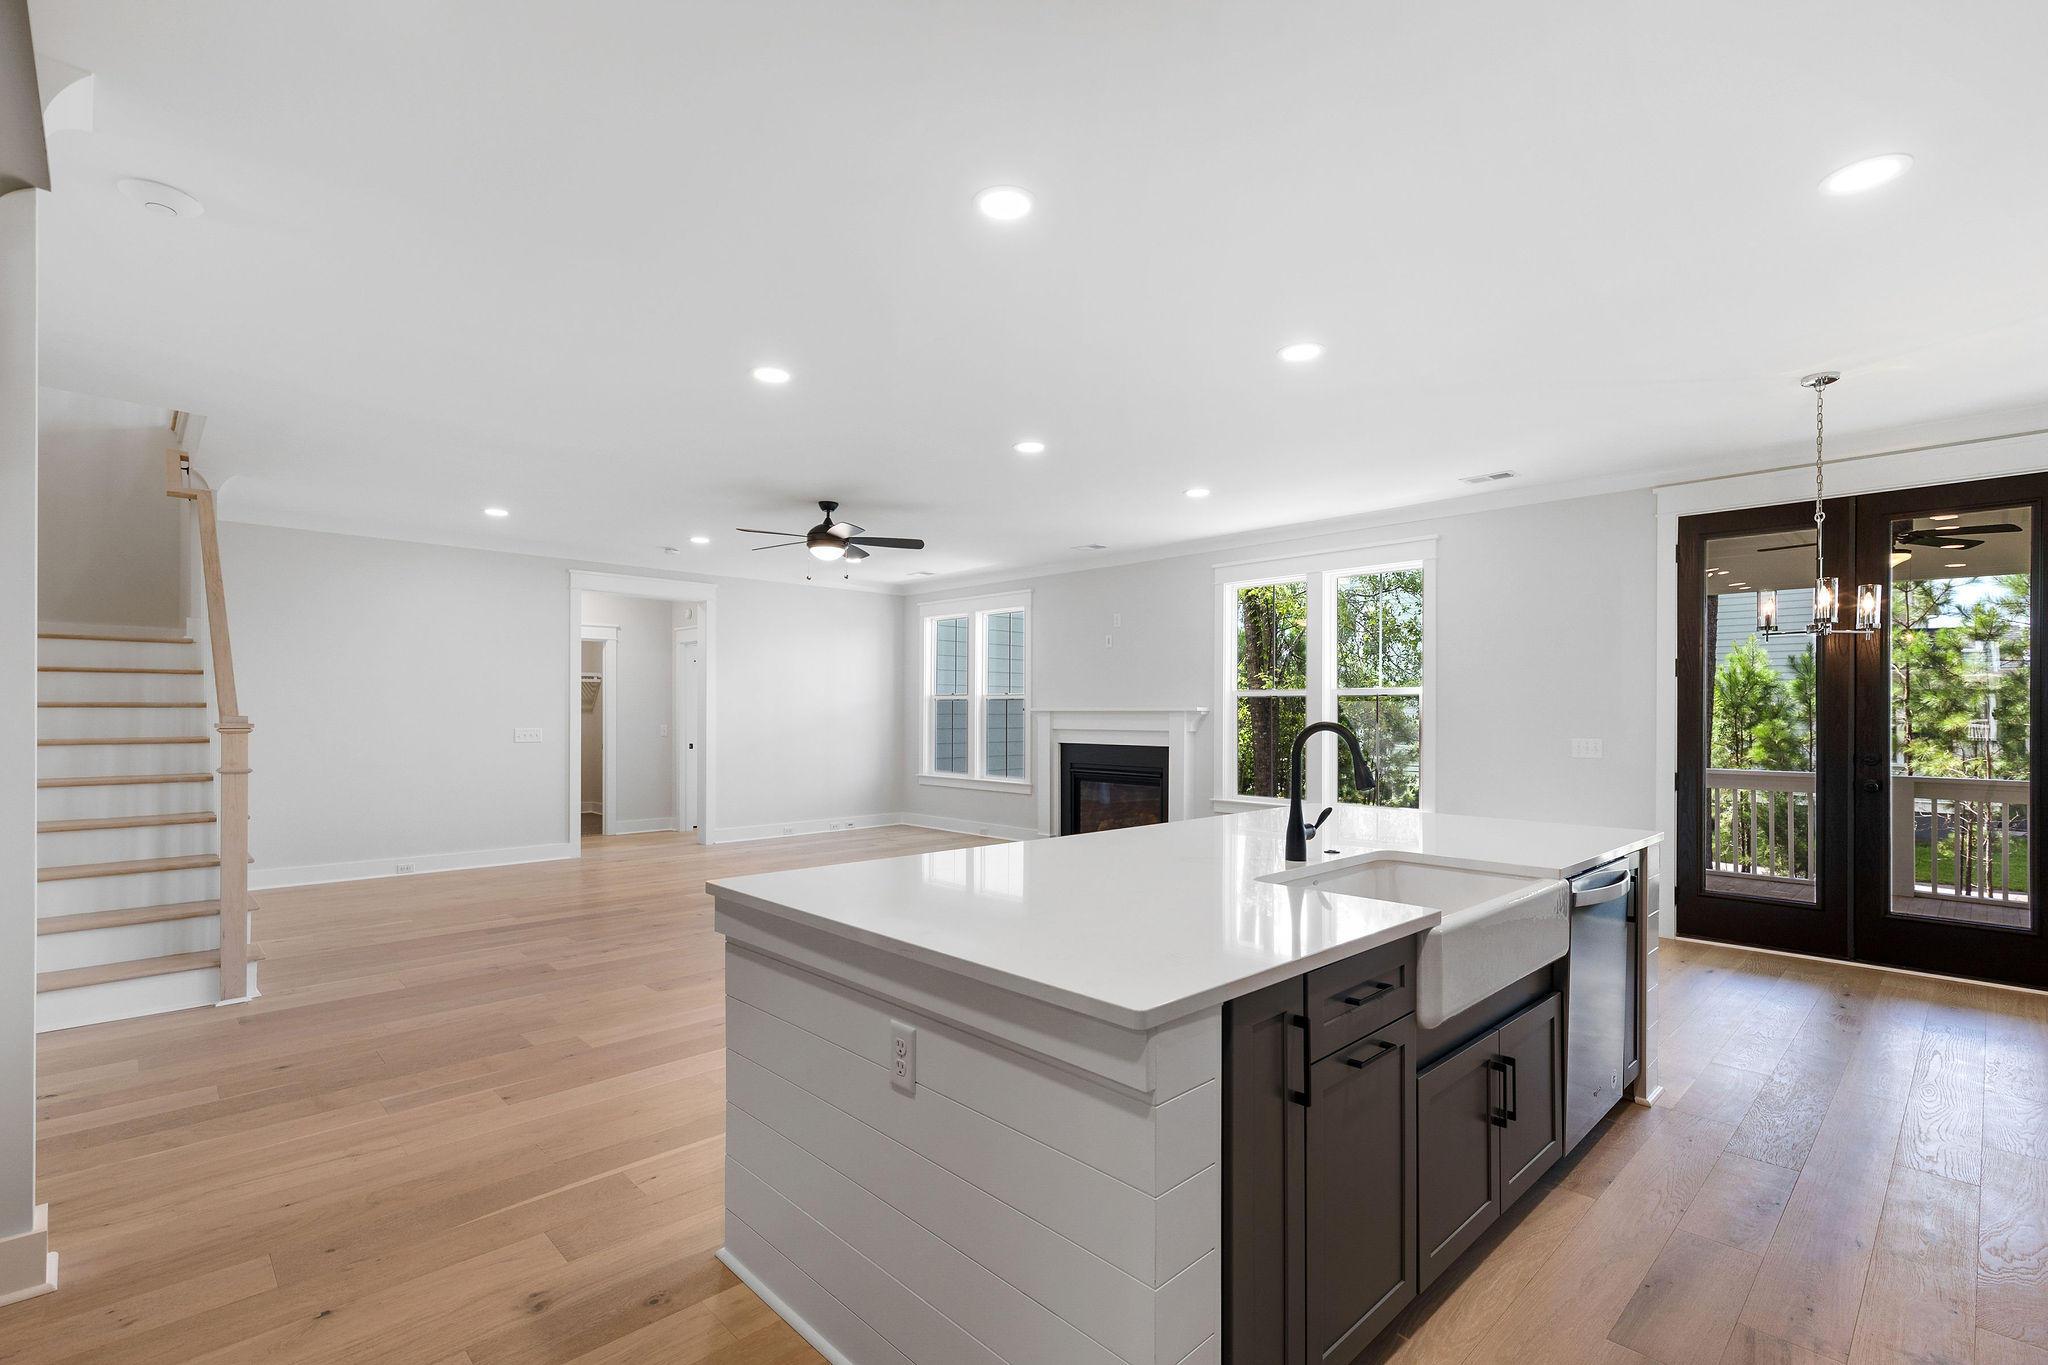 Park West Homes For Sale - 2291 Middlesex, Mount Pleasant, SC - 61